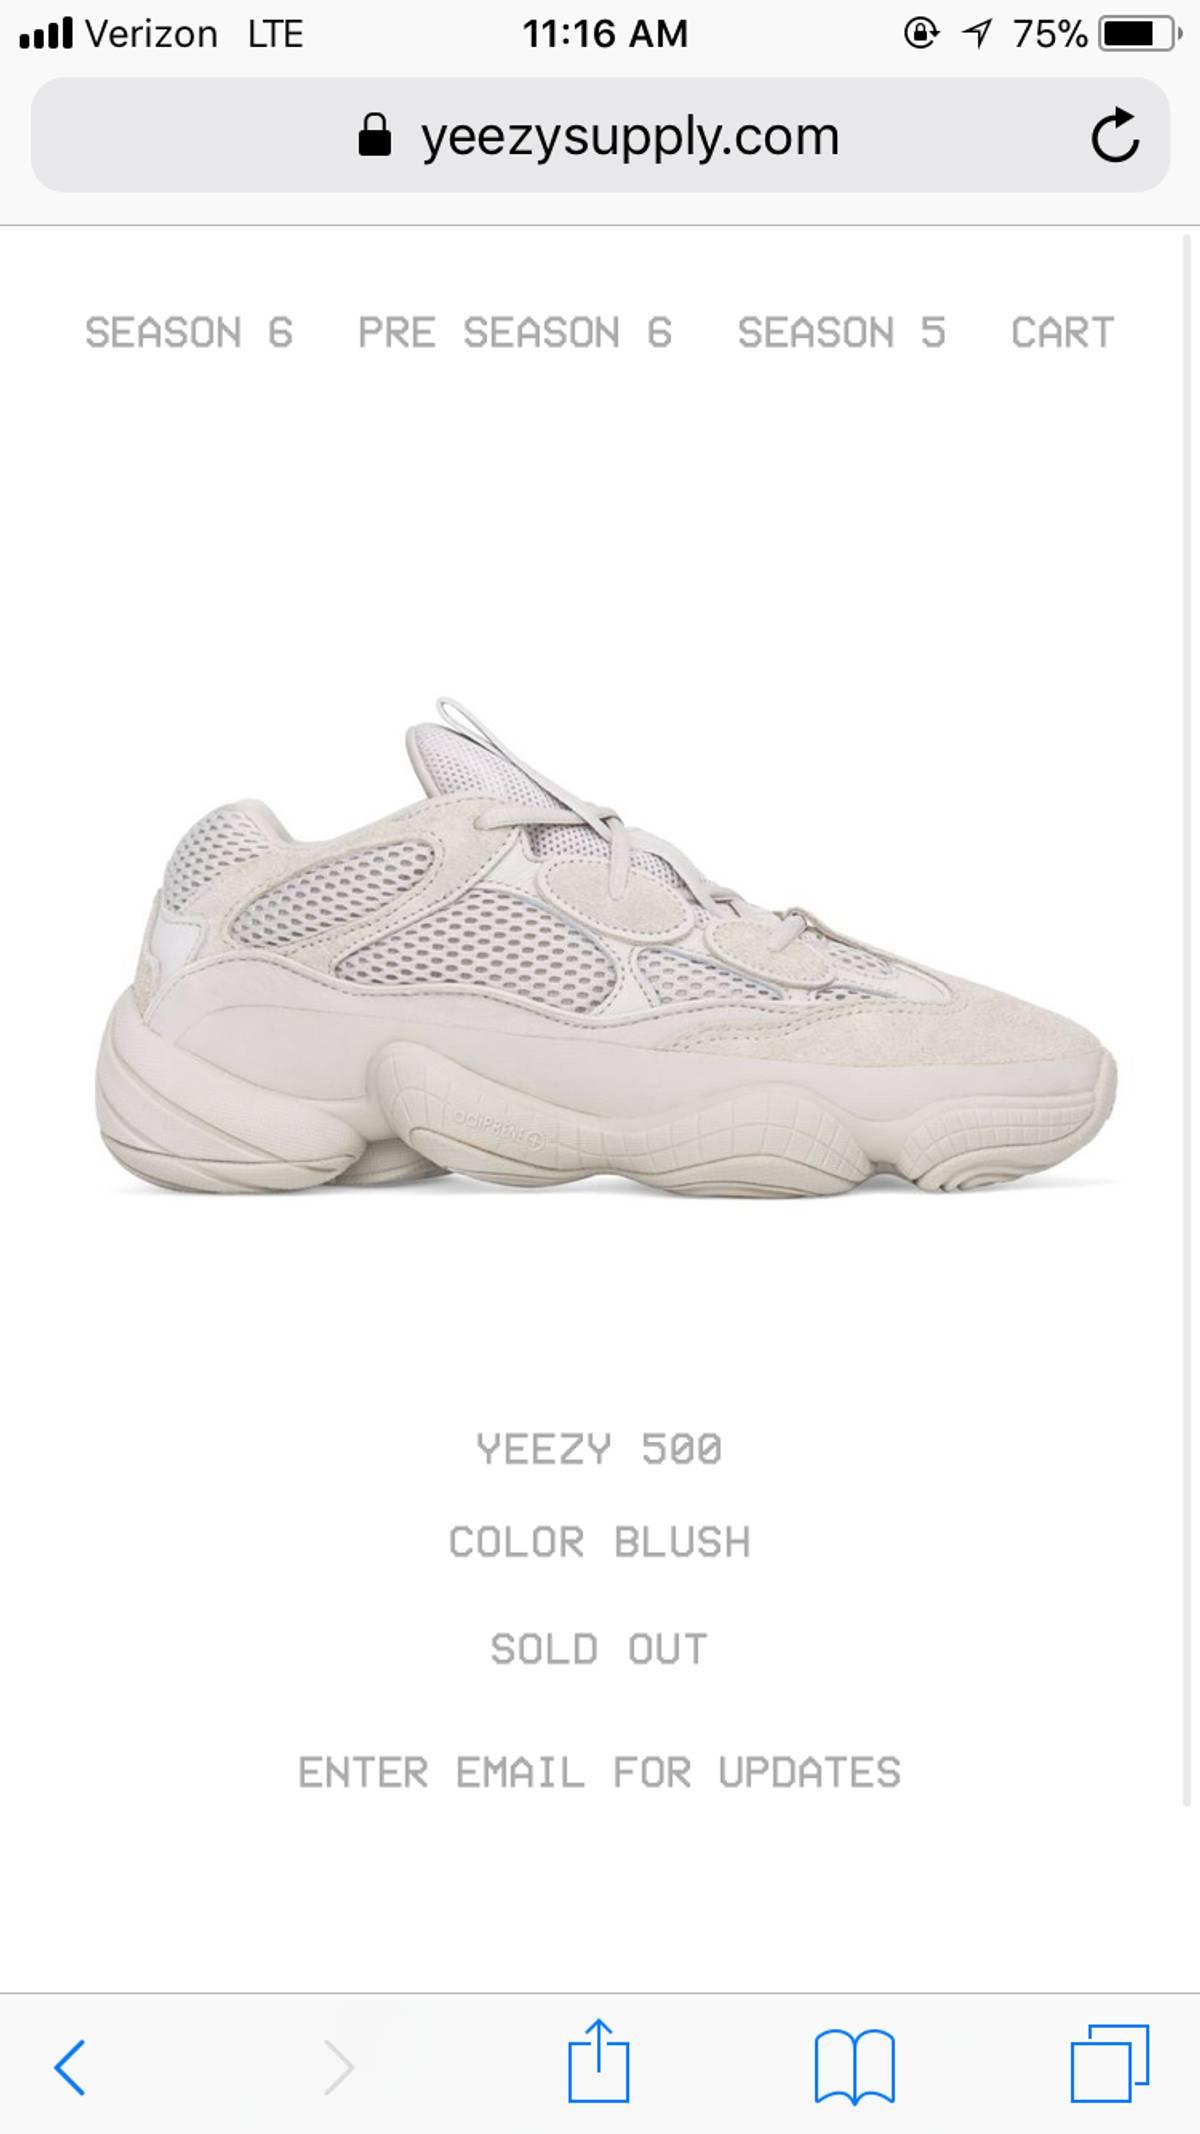 CONFIRMED Adidas Yeezy 500 Blush Size 11